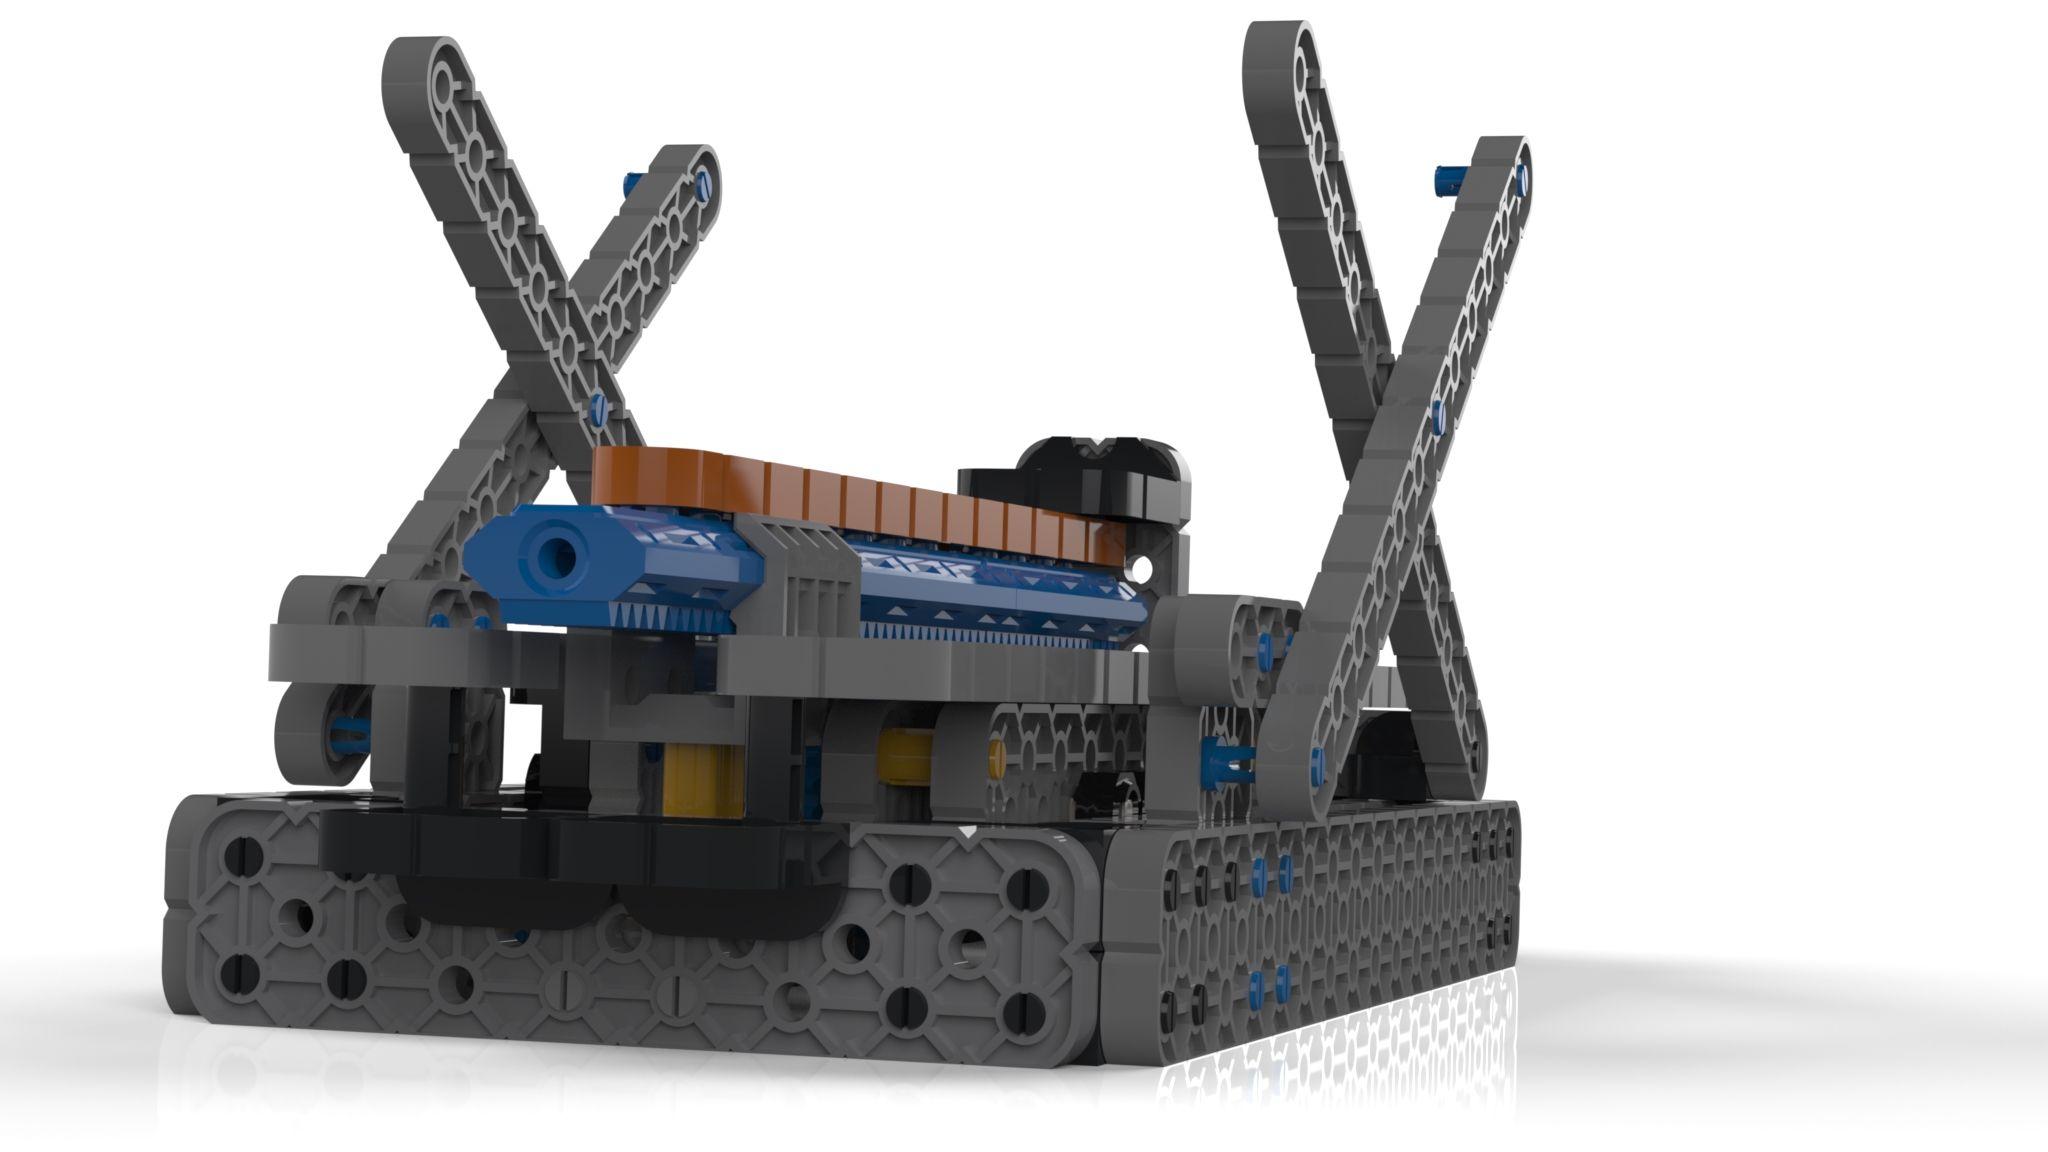 Vex-iq-elevation-mechanics-lcs---fabrica-de-nerdes-02-3500-3500